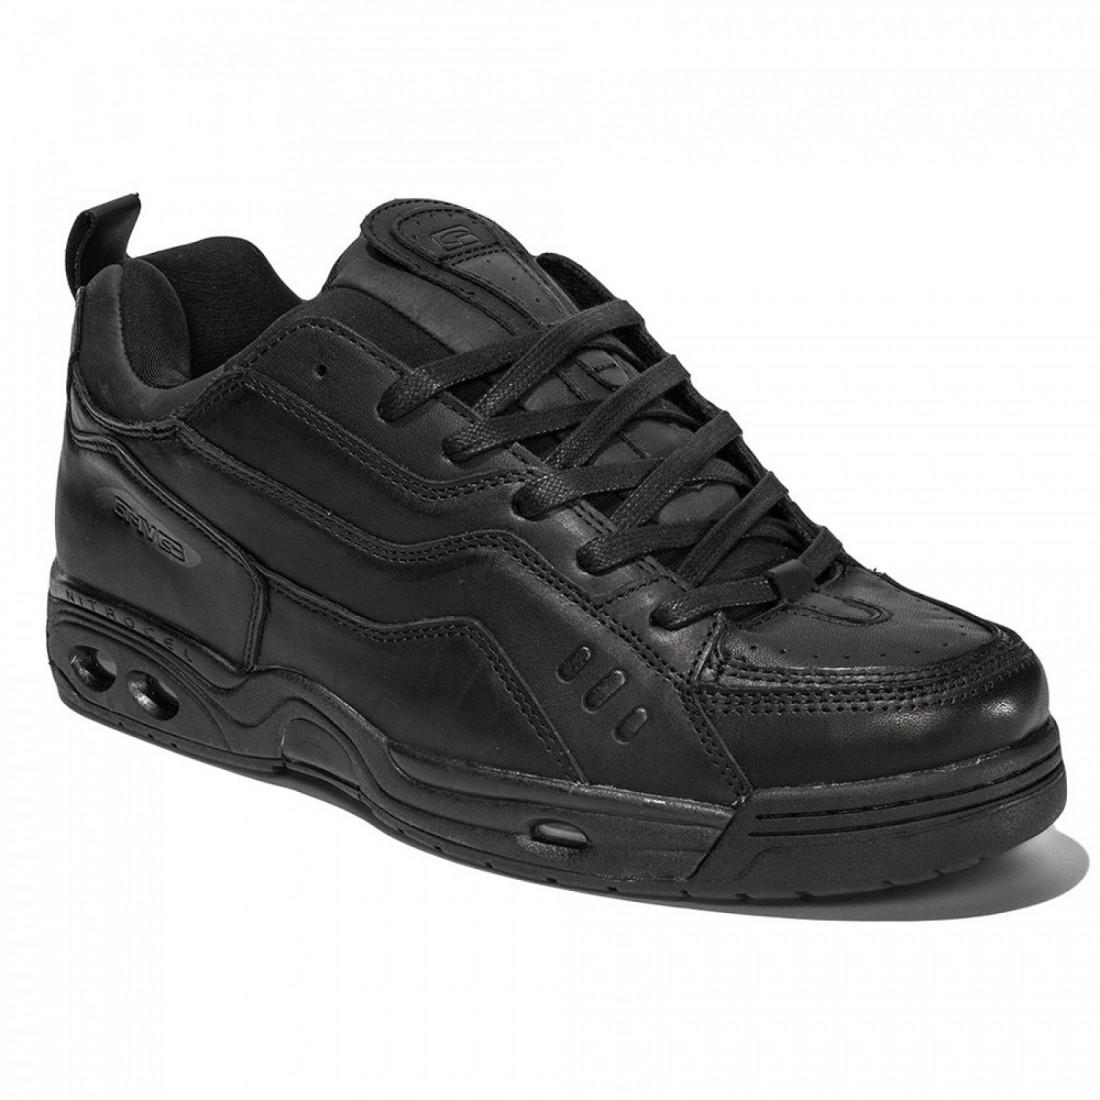 CHET THOMAS IV DLX black leather